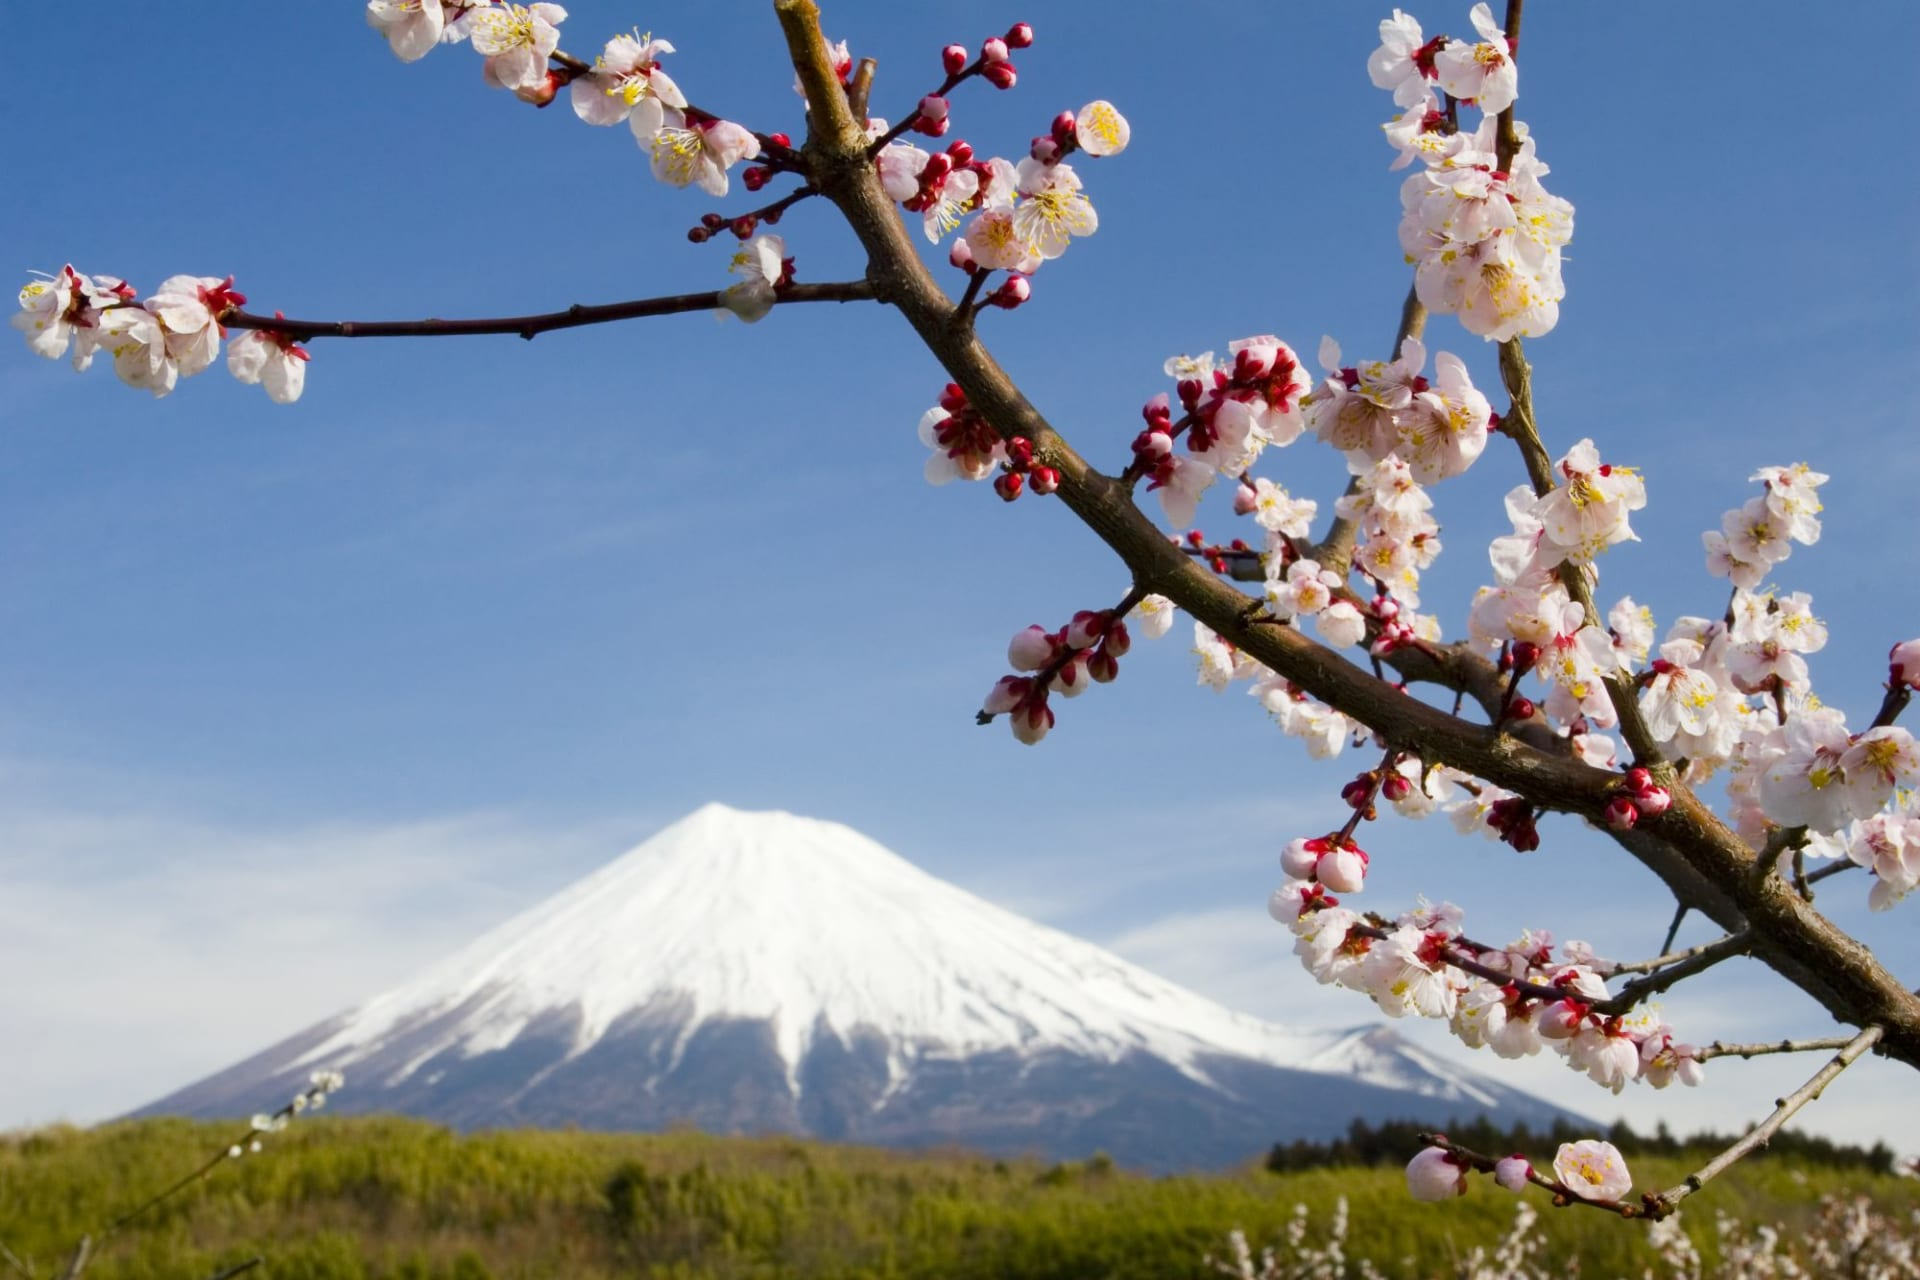 Mt. Fuji & Kirschblüten